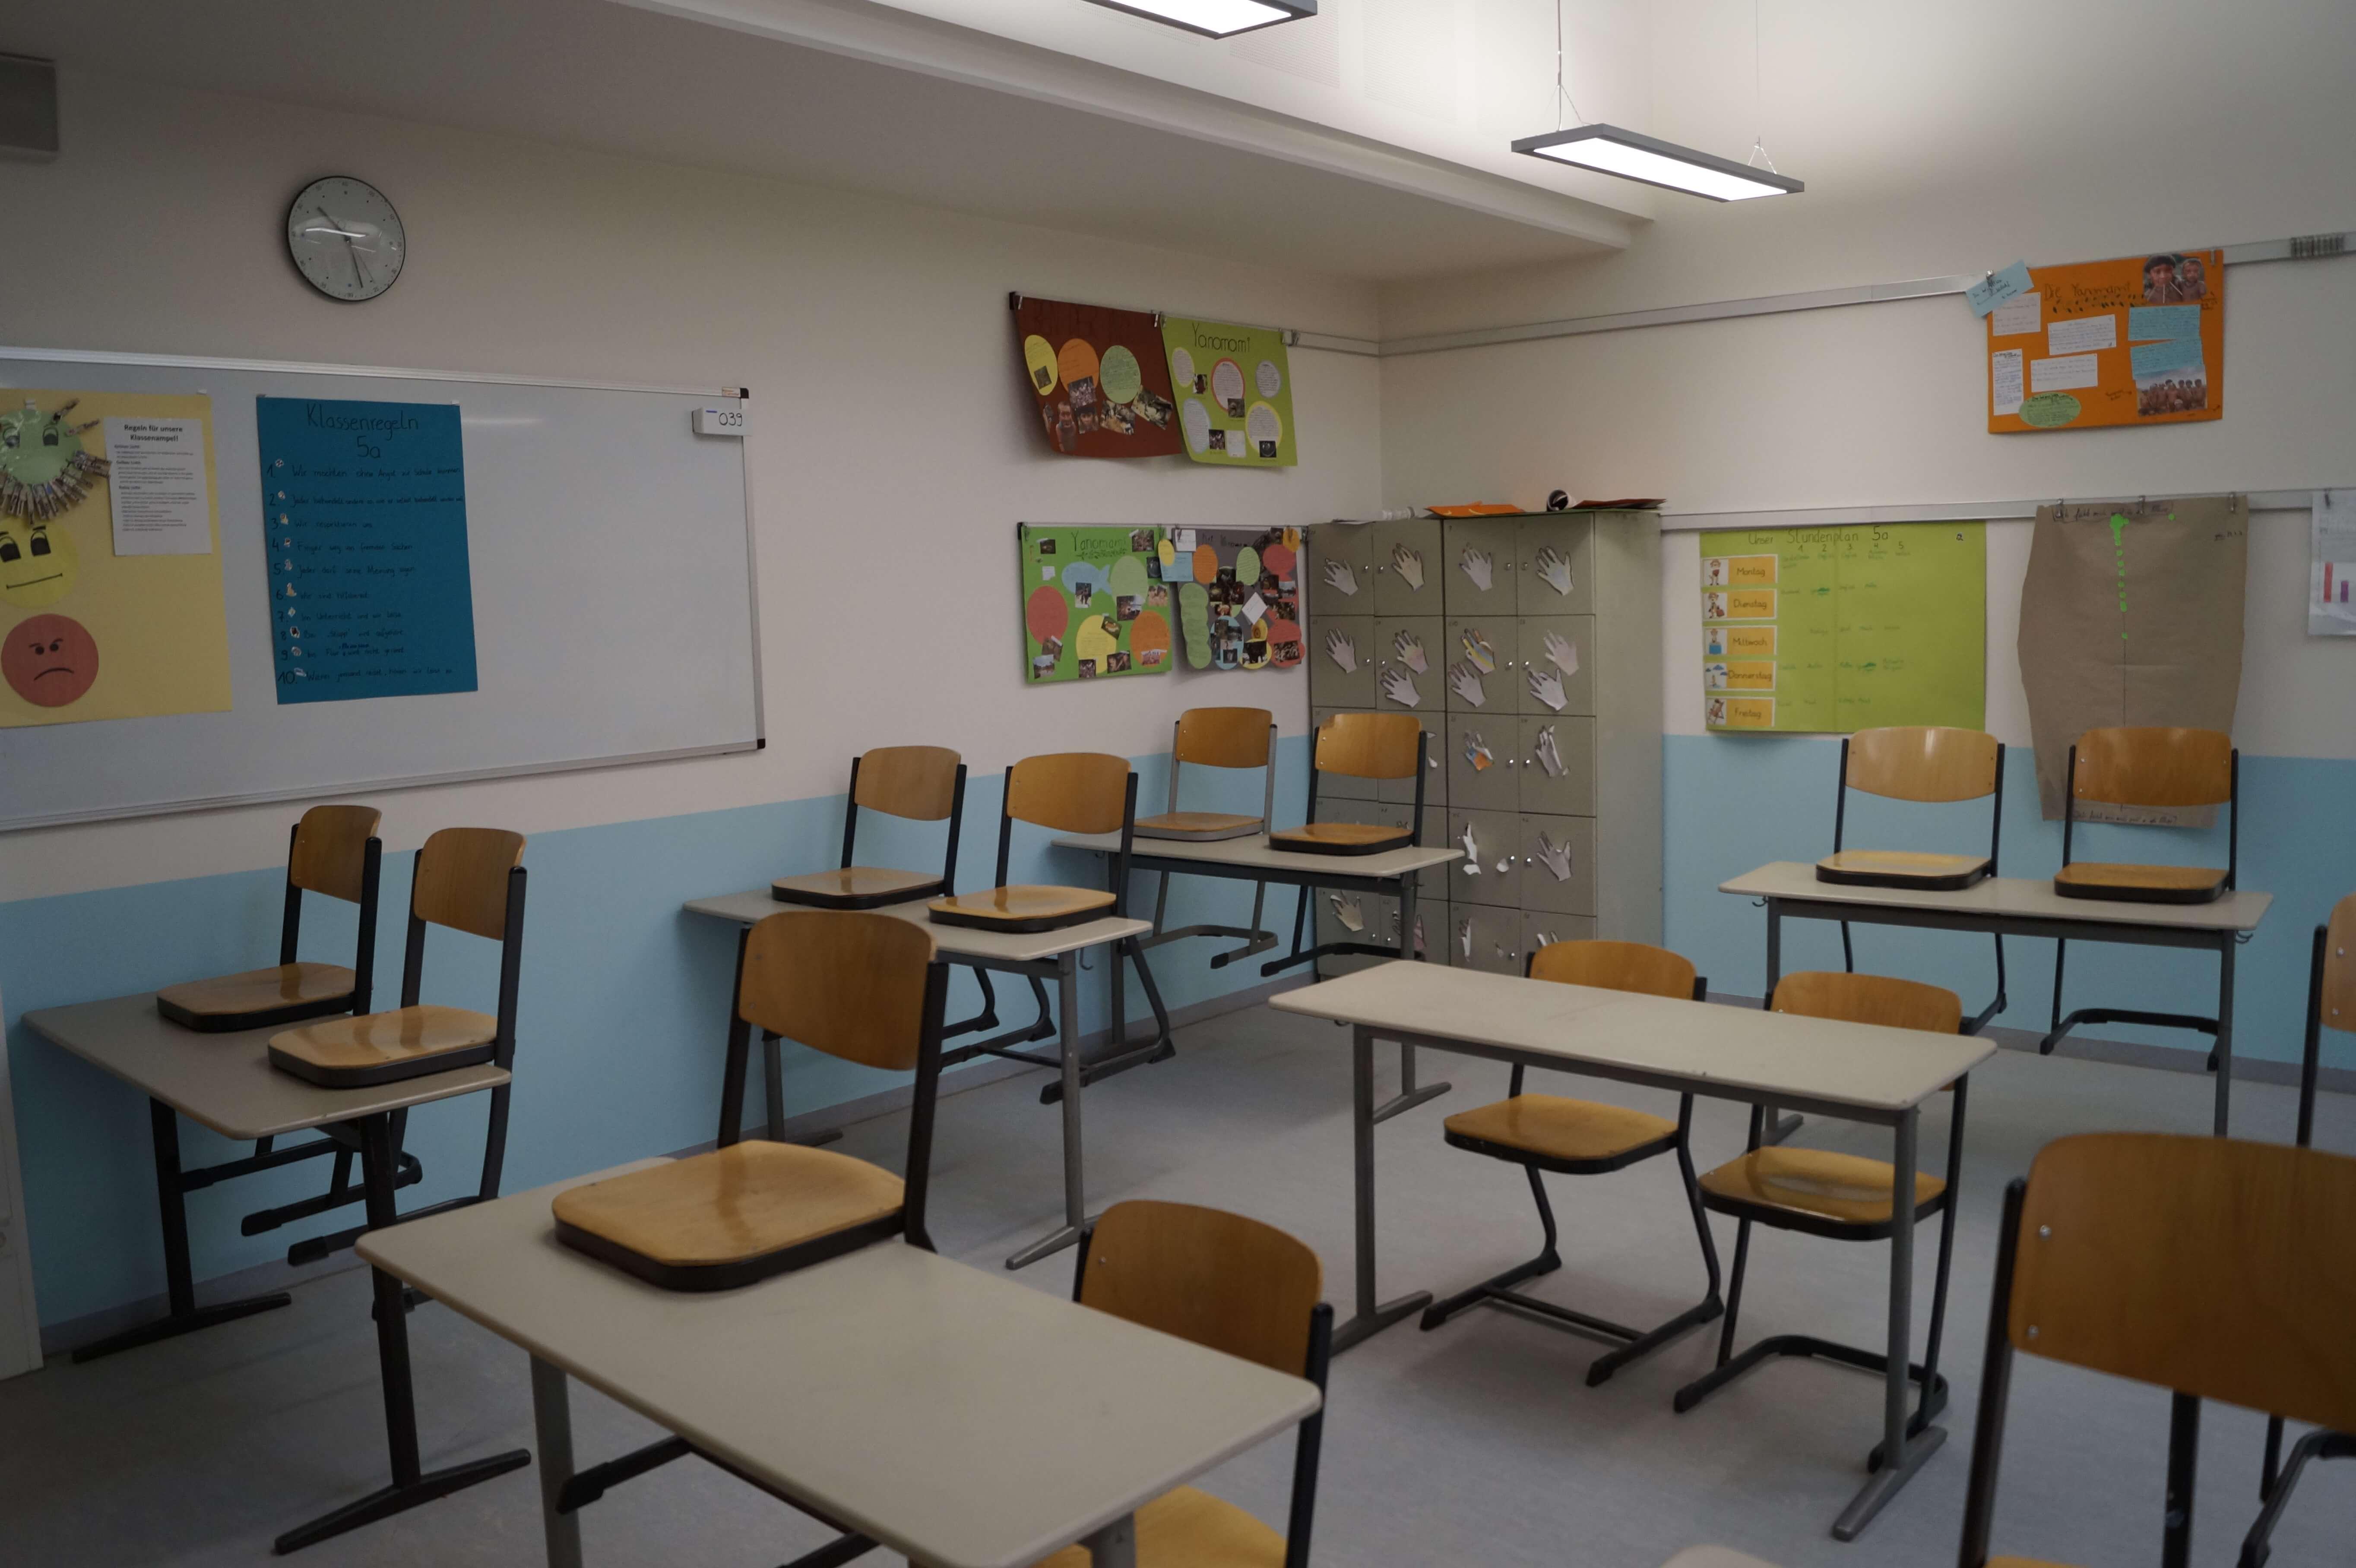 Klassenraum__2_.JPG